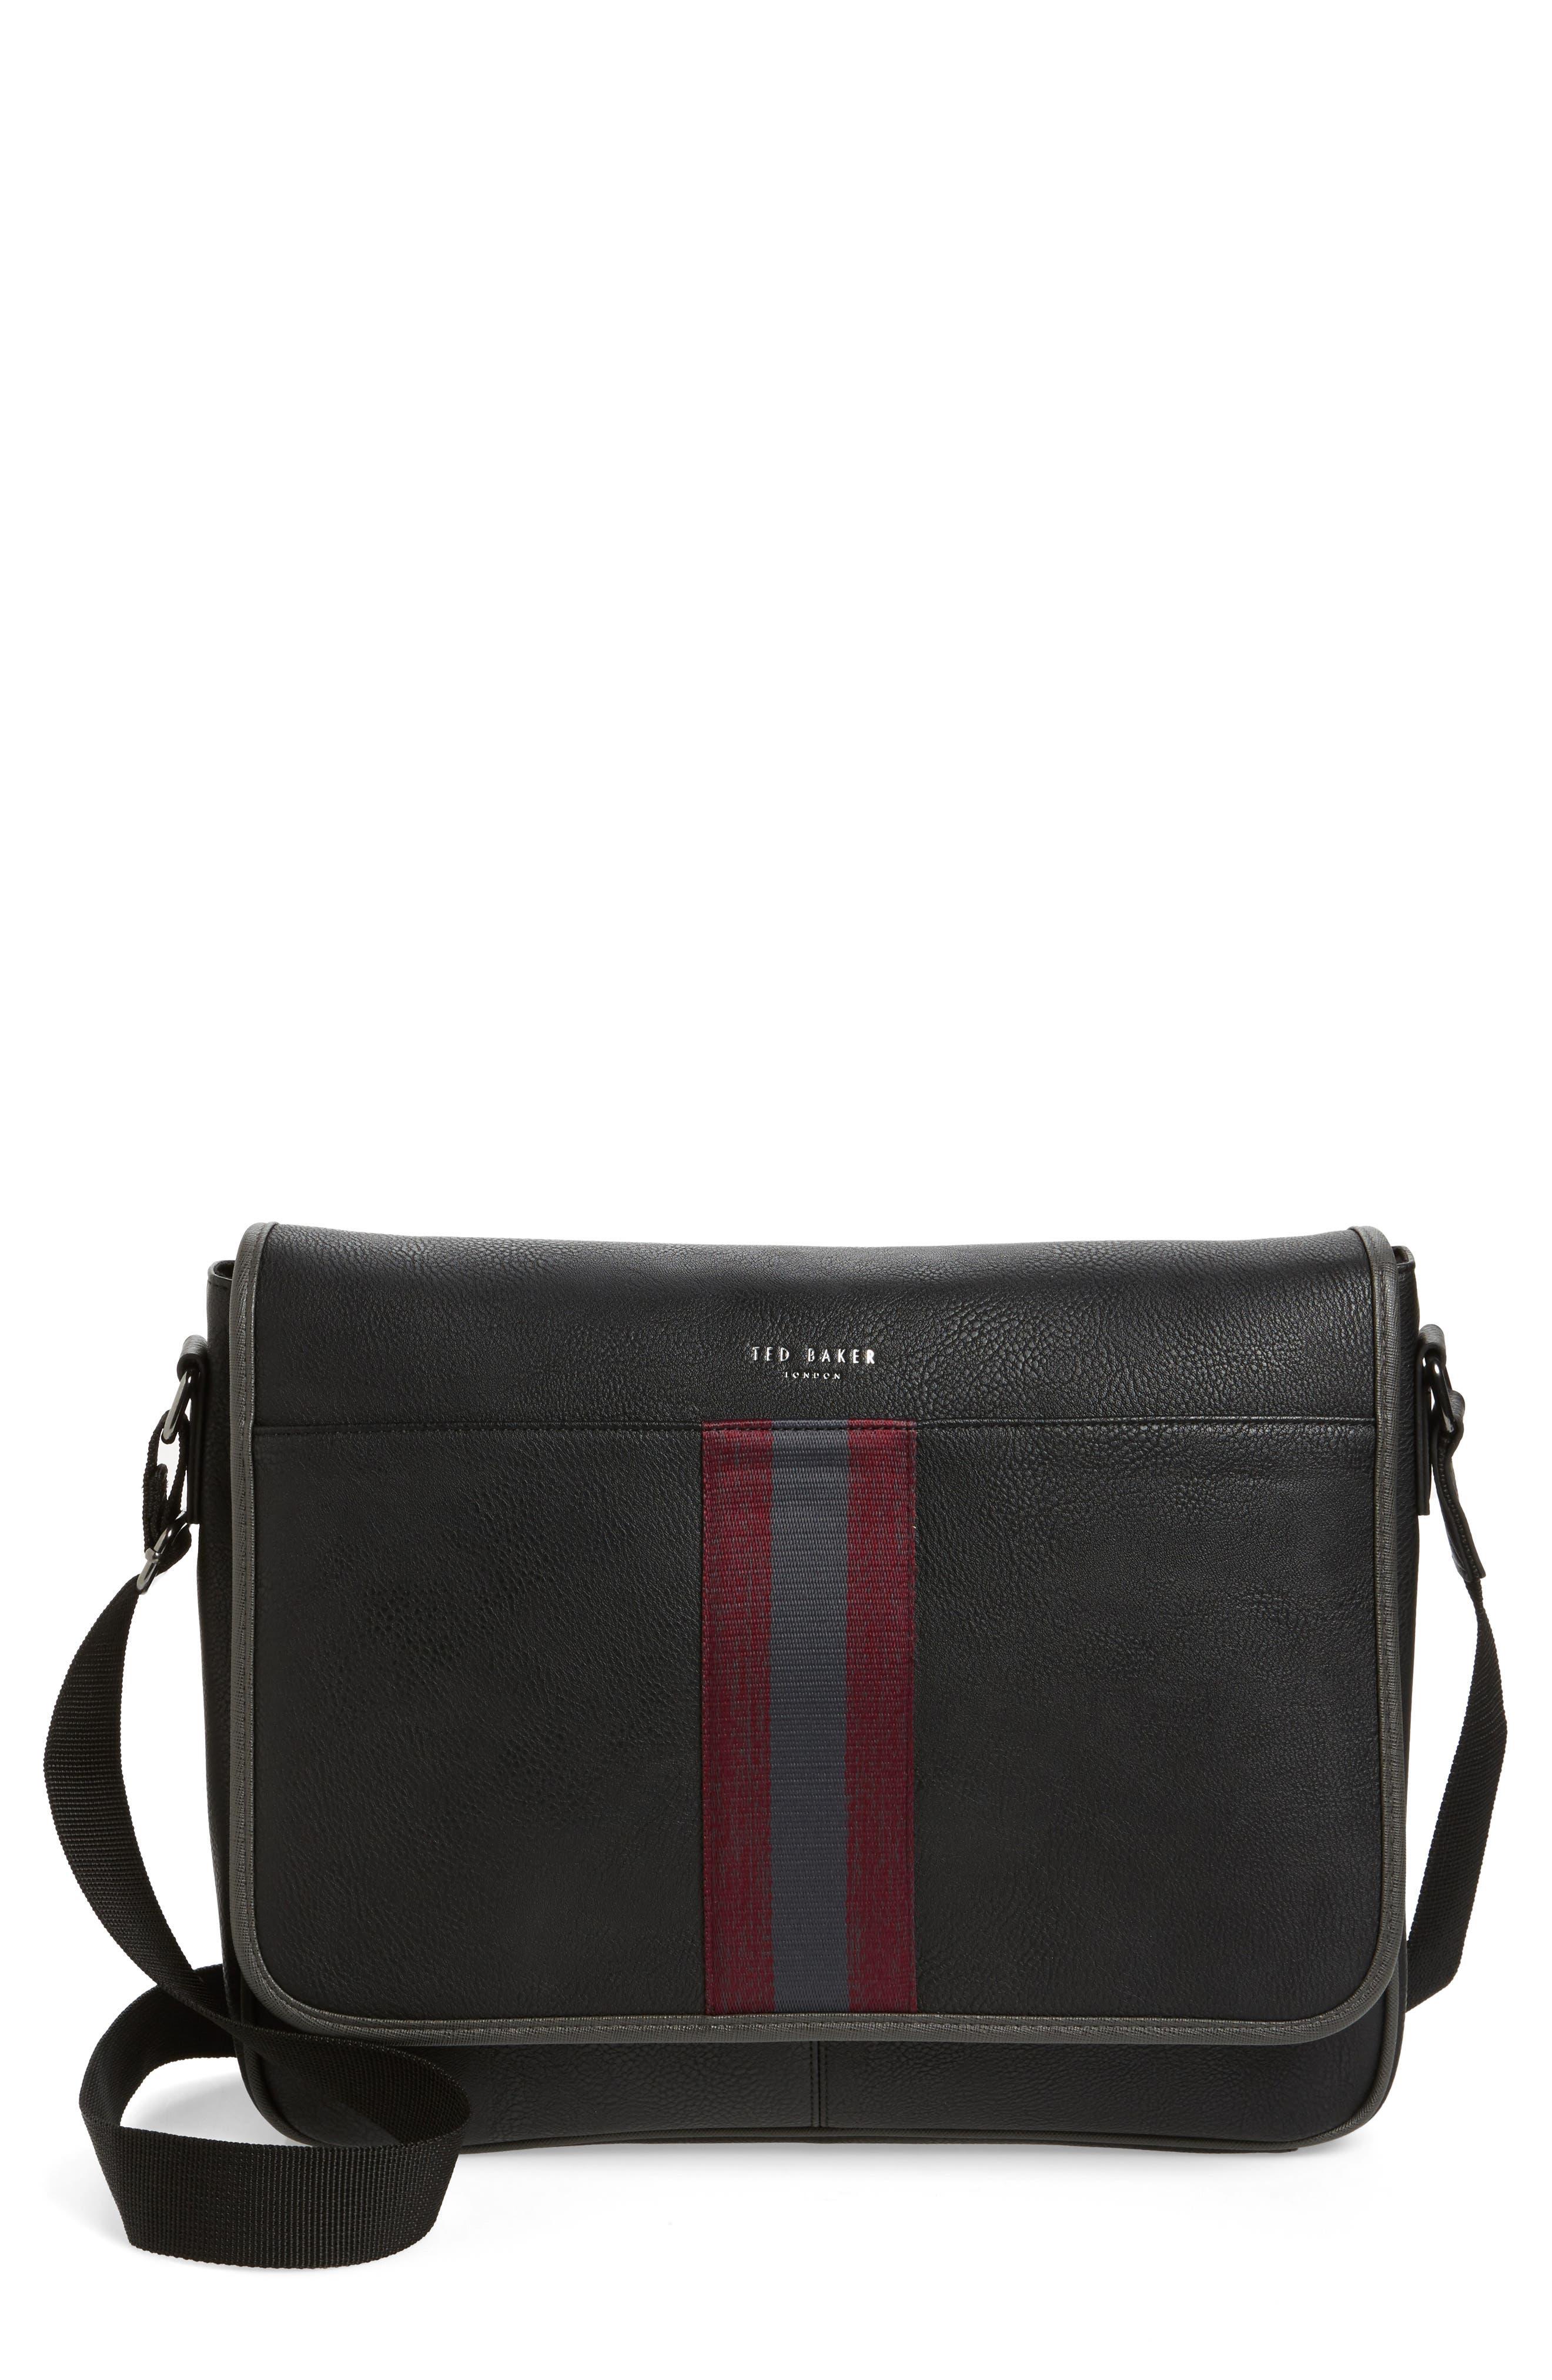 Buzard Messenger Bag,                             Main thumbnail 1, color,                             Black